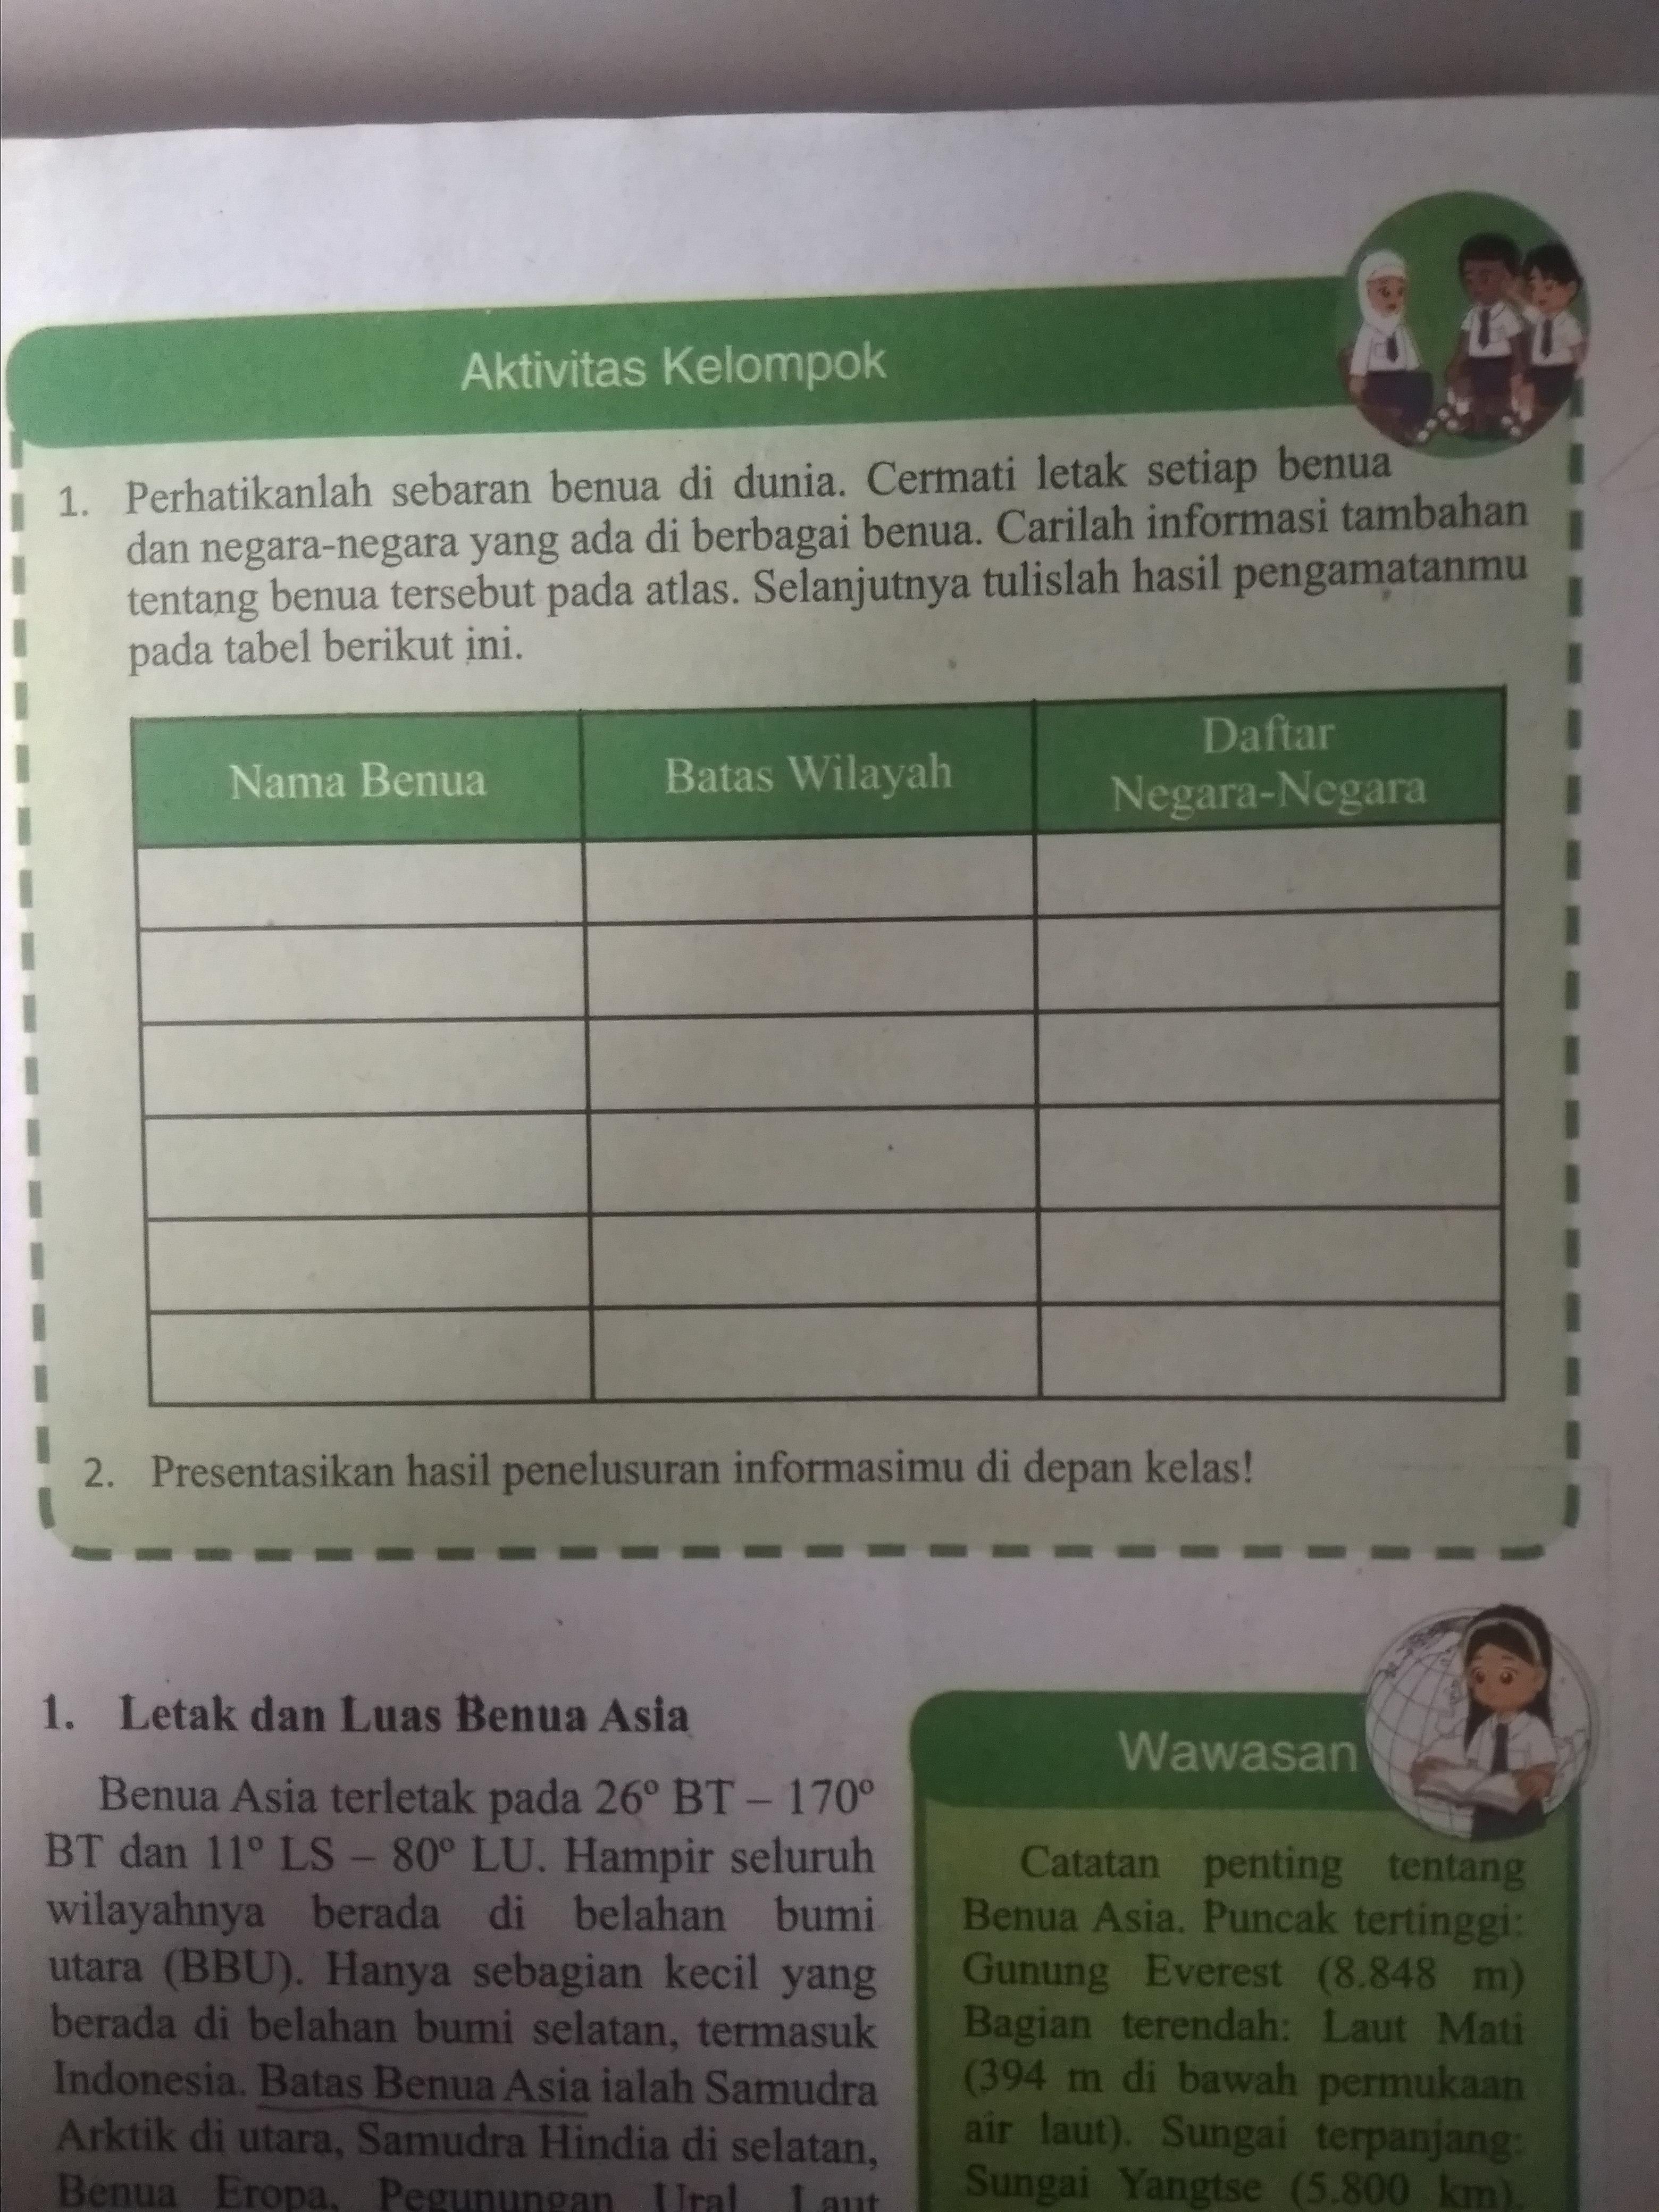 Demikian informasi tentang kunci jawaban (pembahasan) latihan soal penilaian akhir semester (pas) bahasa indonesia kelas 9 smp / mts semester 1, semoga. 7 Kunci Jawaban Buku Bahasa Indonesia Kelas 9 Halaman 13 Image Hd Sigma Blog Edu